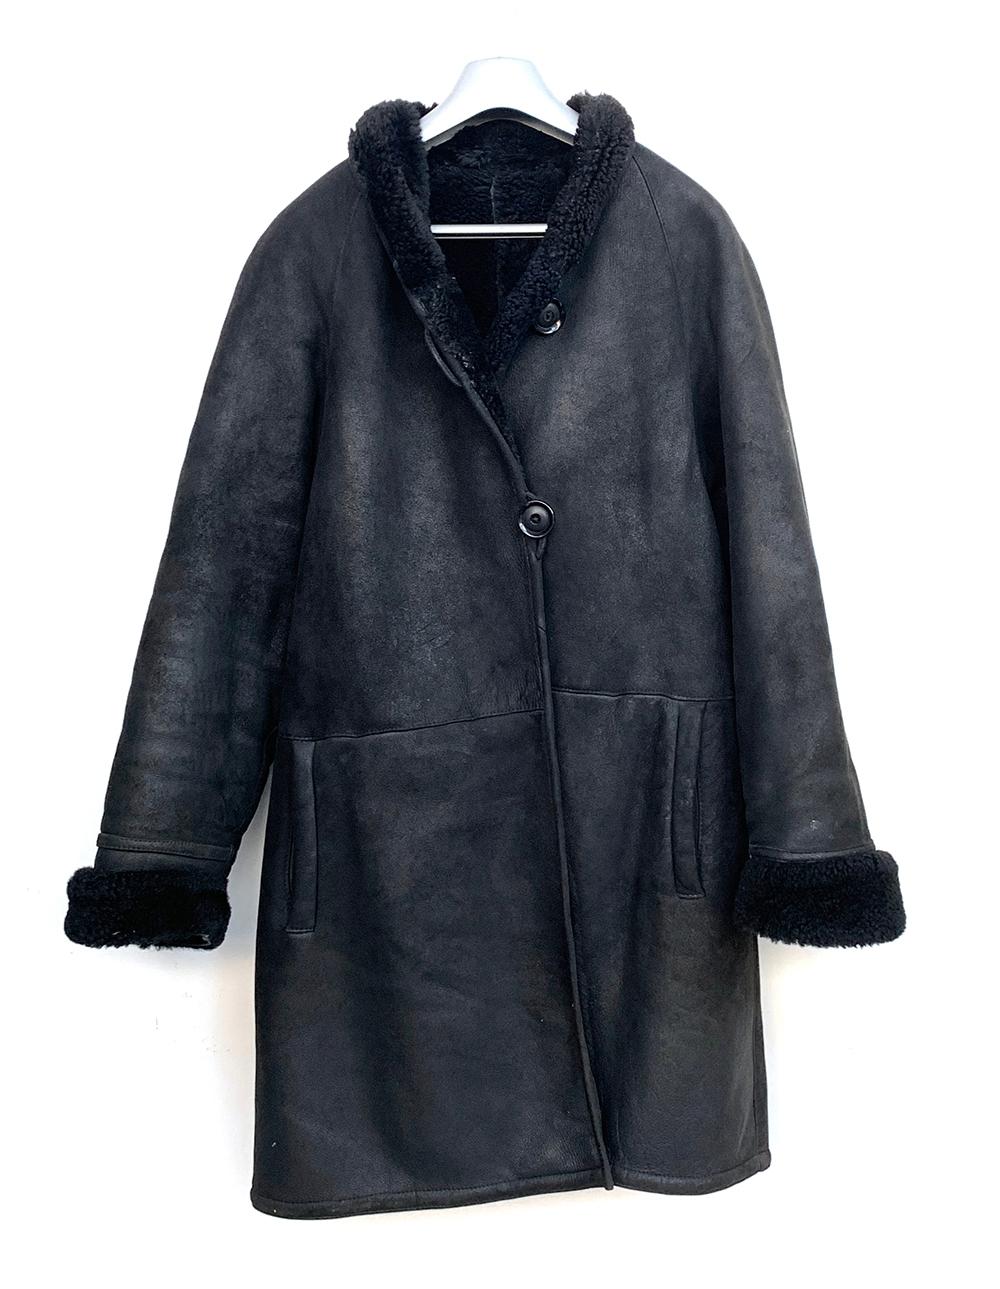 A Mani black sheepskin coat, size 40